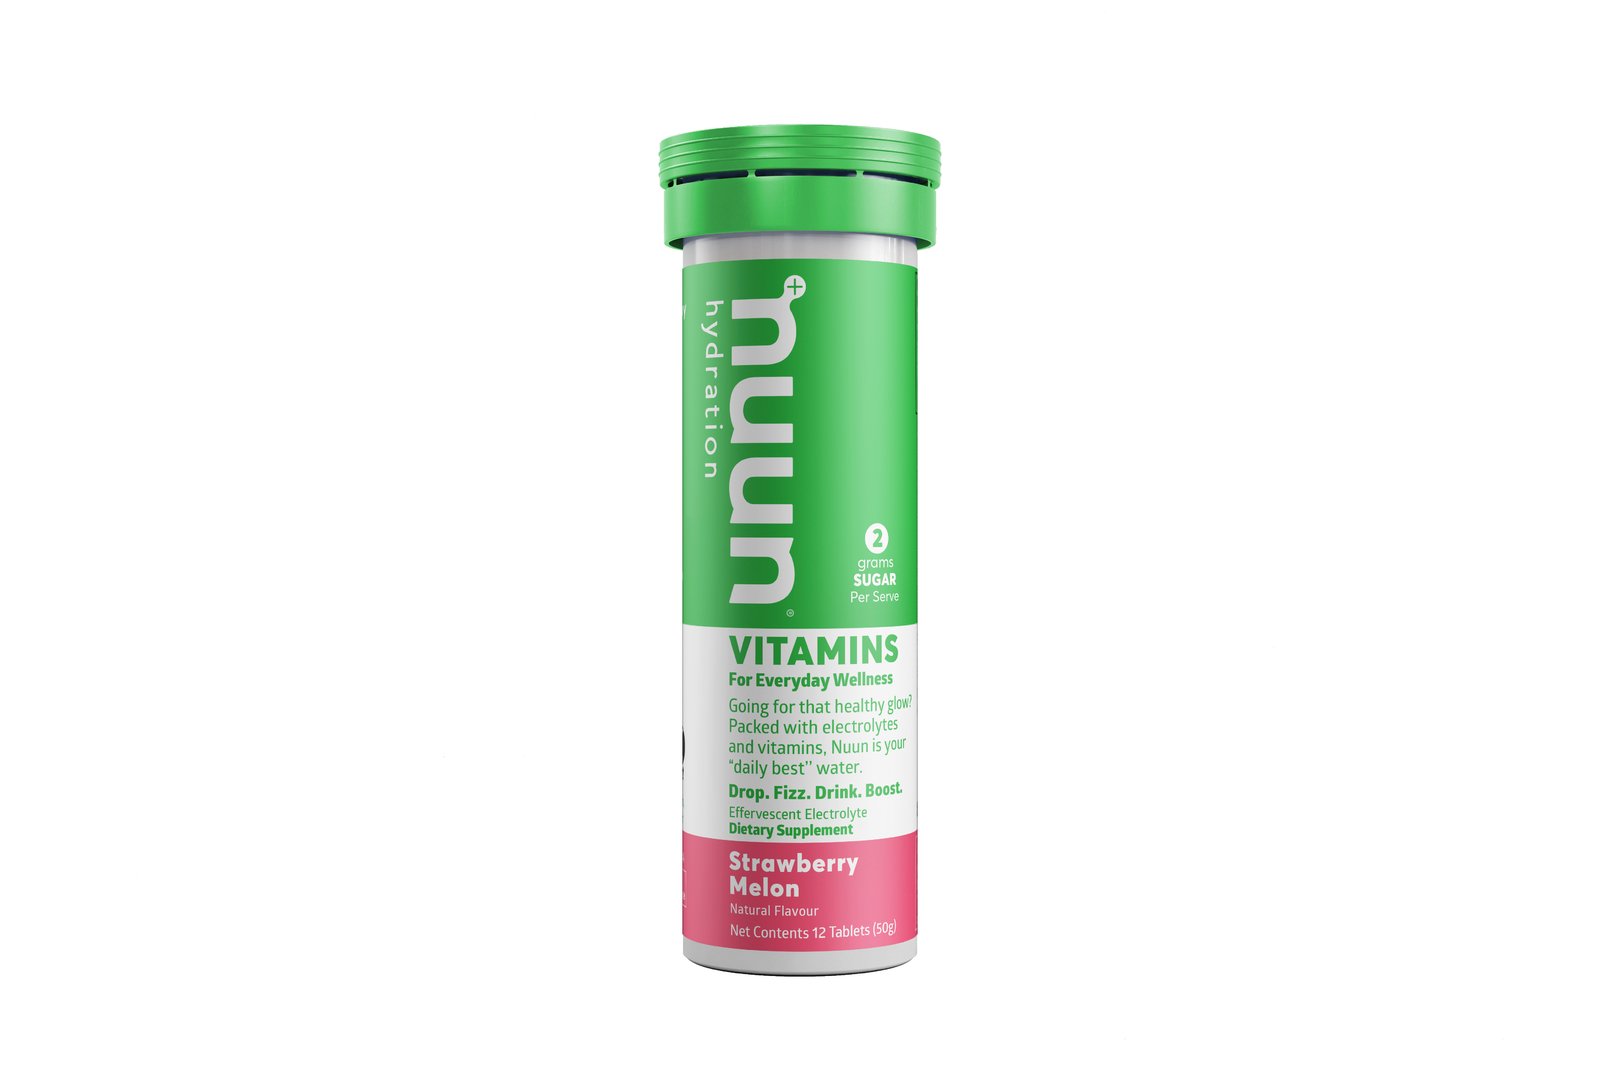 Nuun Vitamin Tablets - Strawberry Melon image